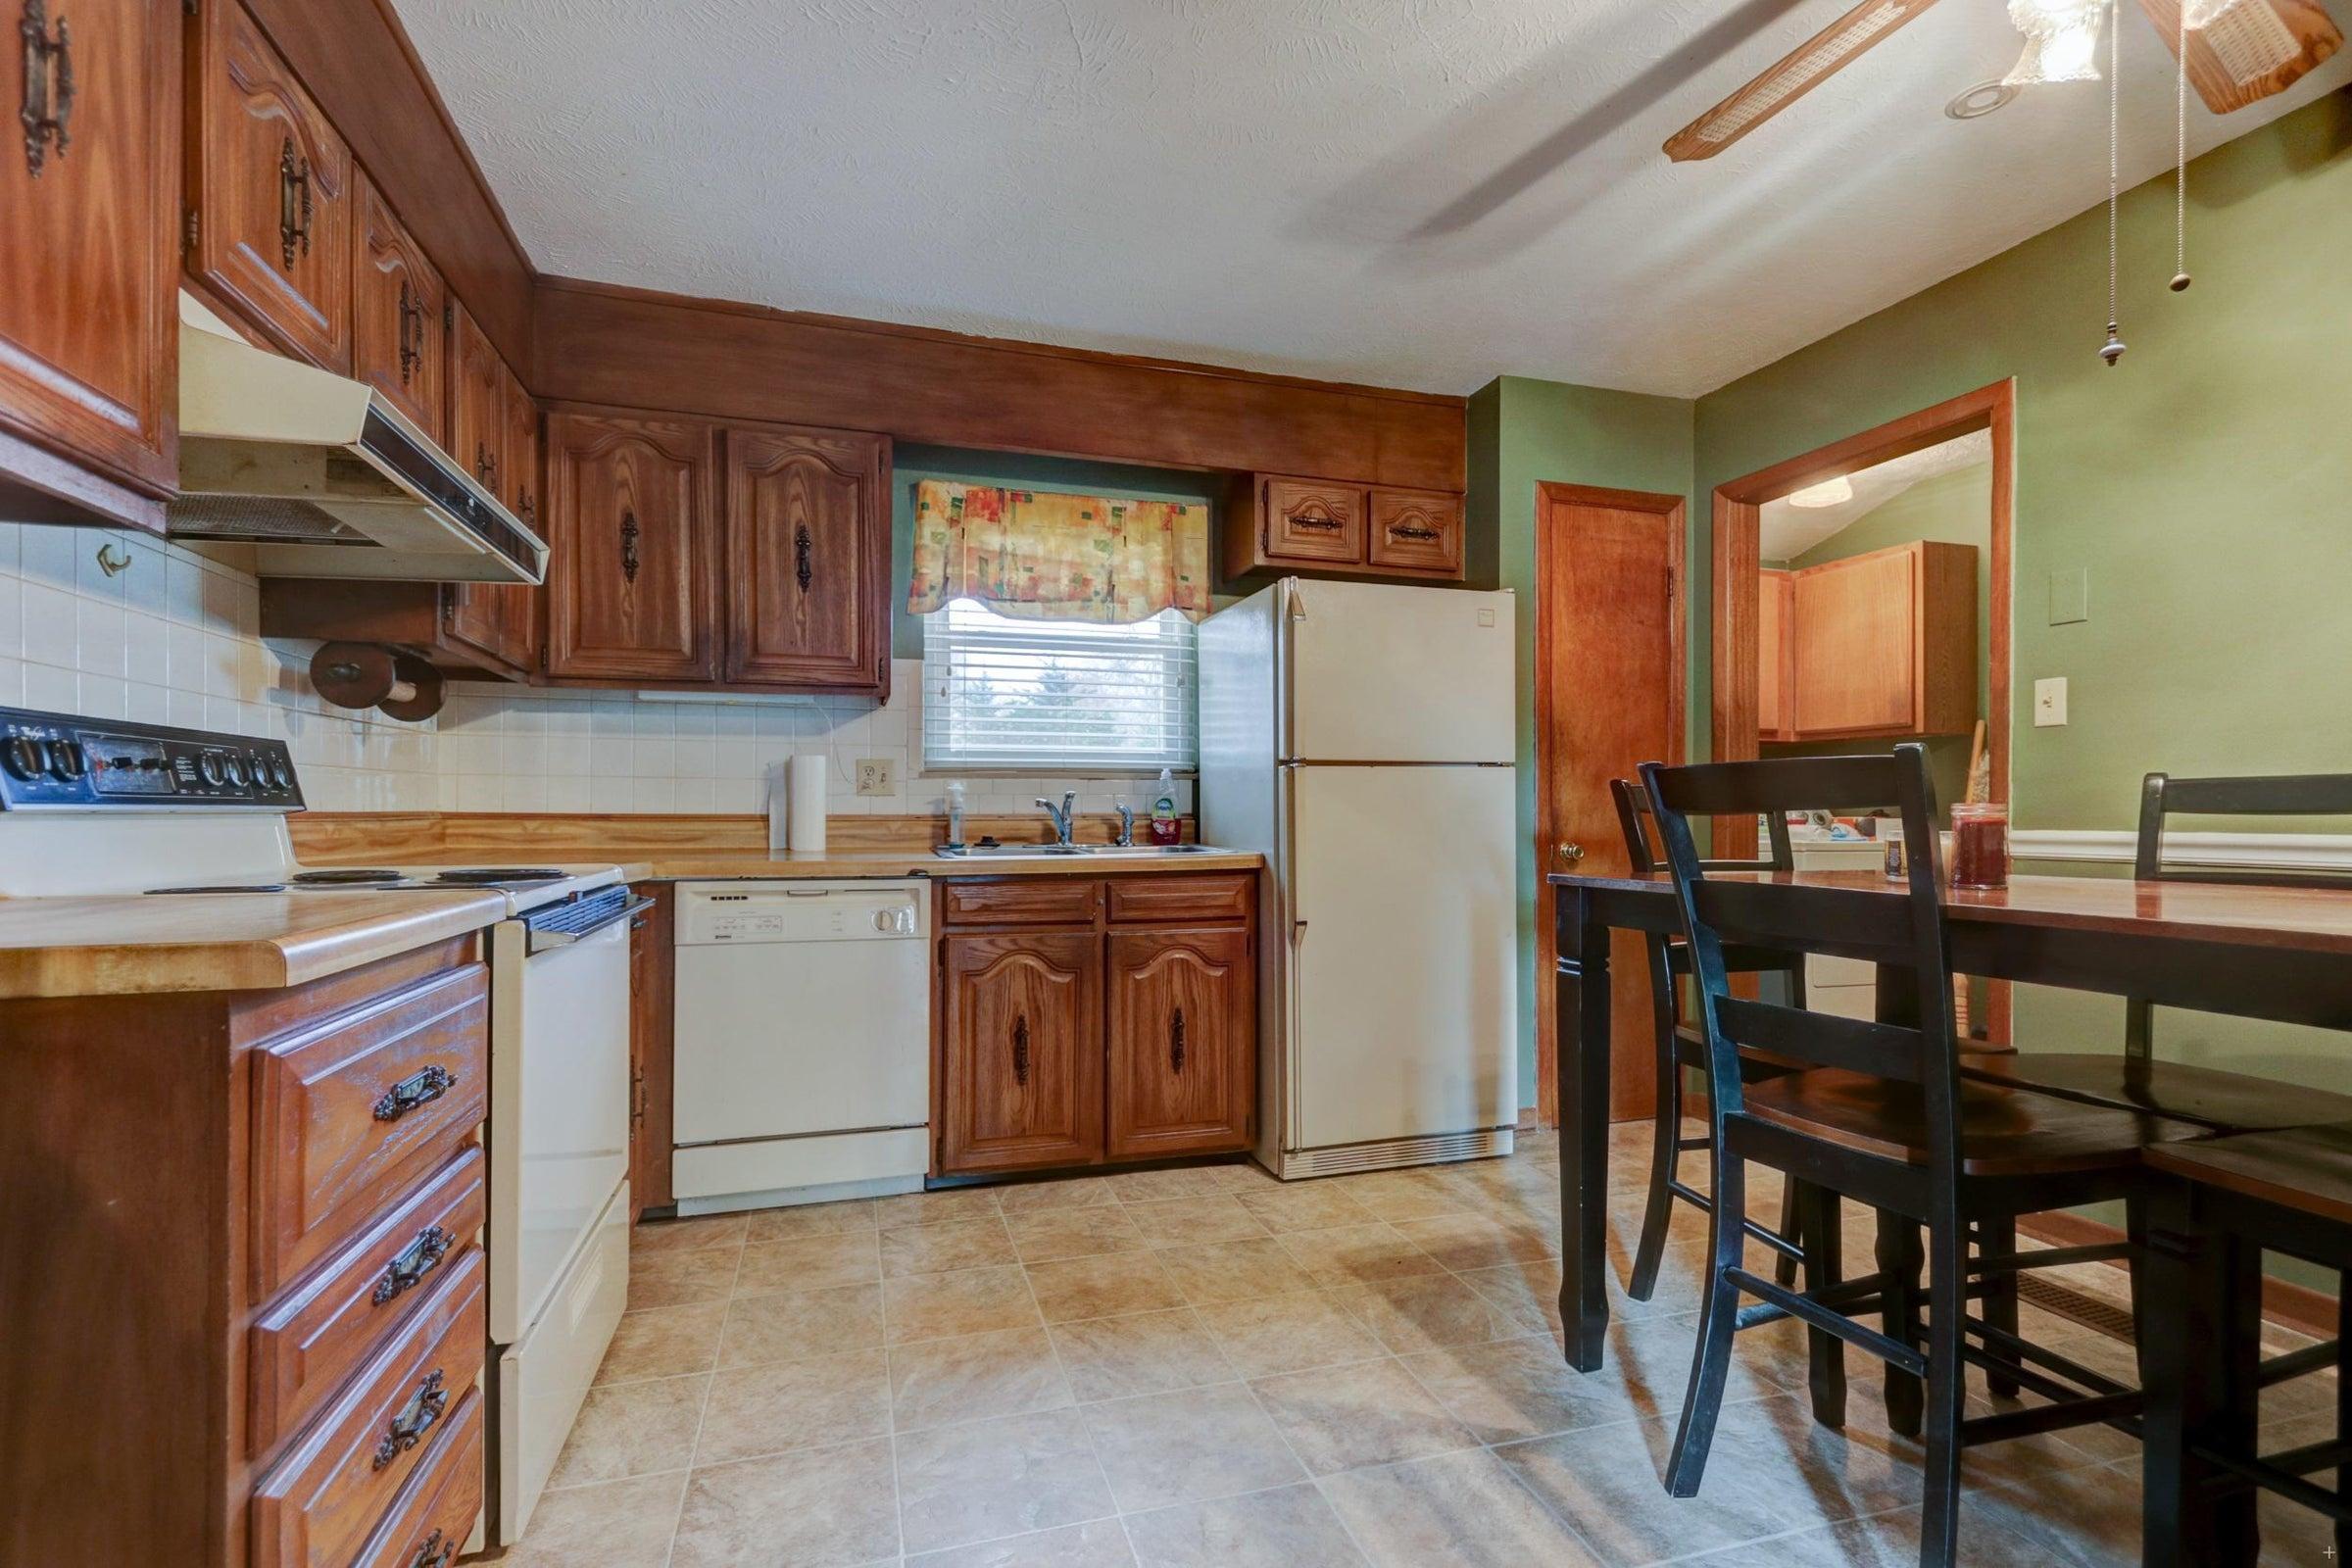 301 Engert Kitchen cabinets close up